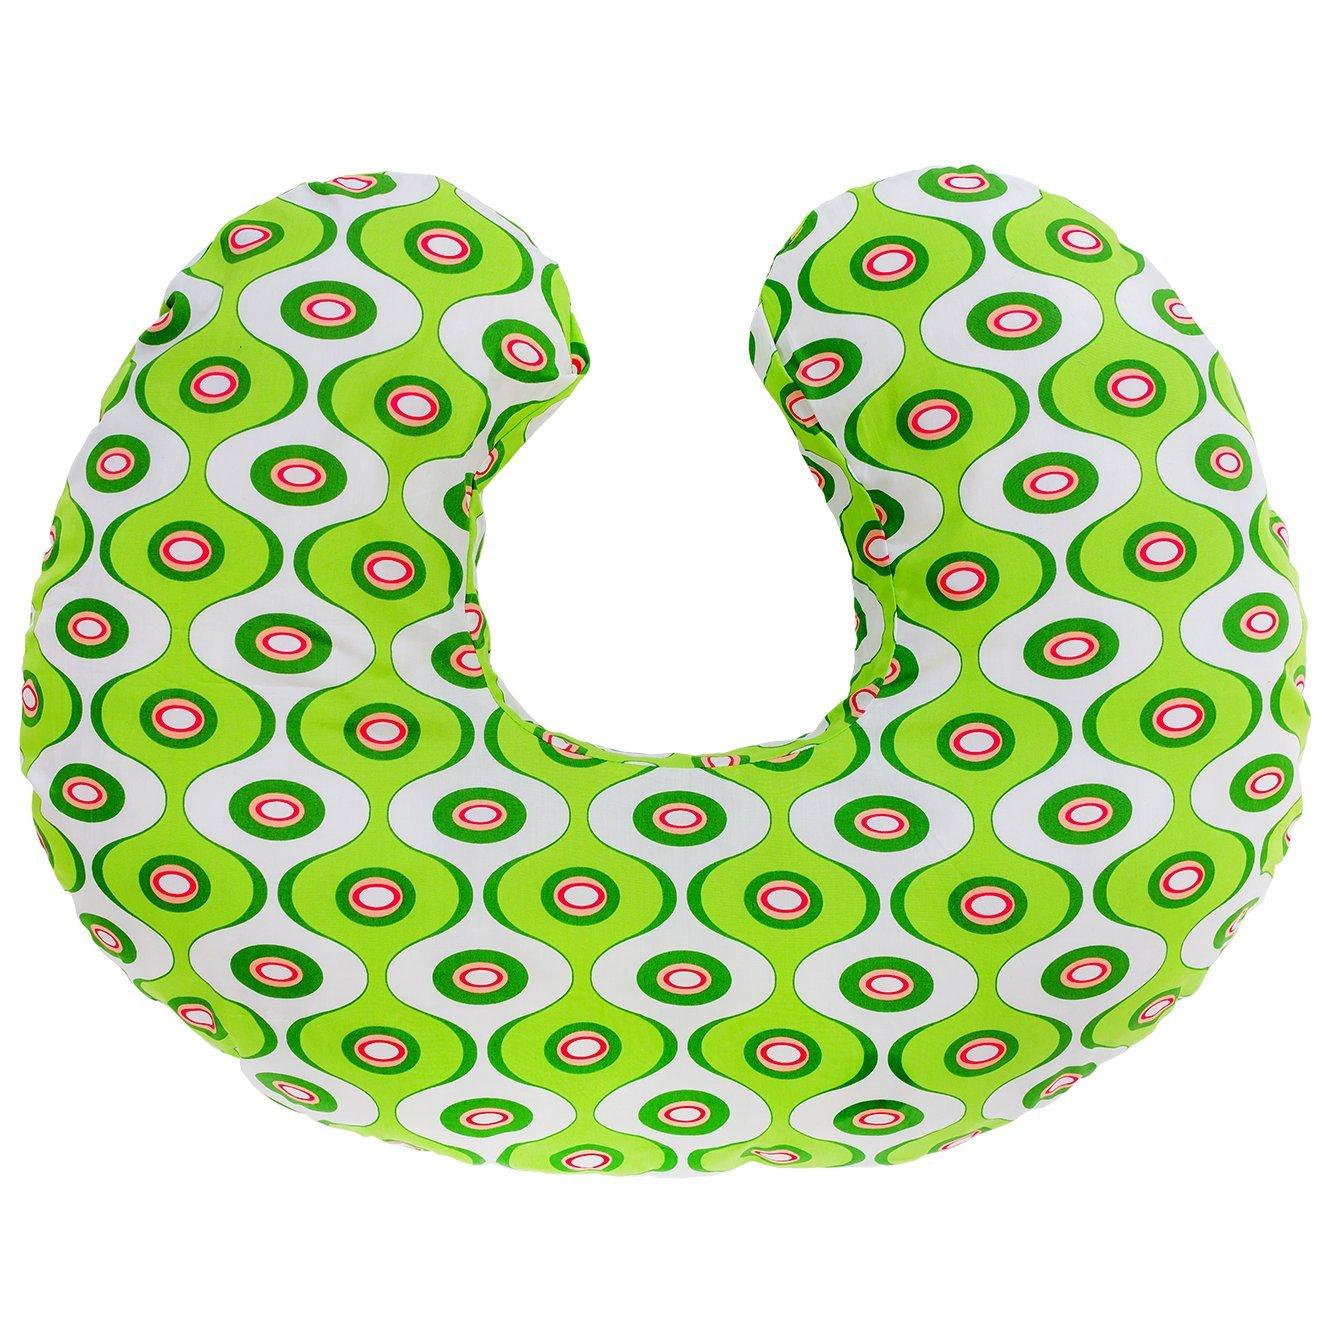 Nursing Pillow Cover – Organic Cotton